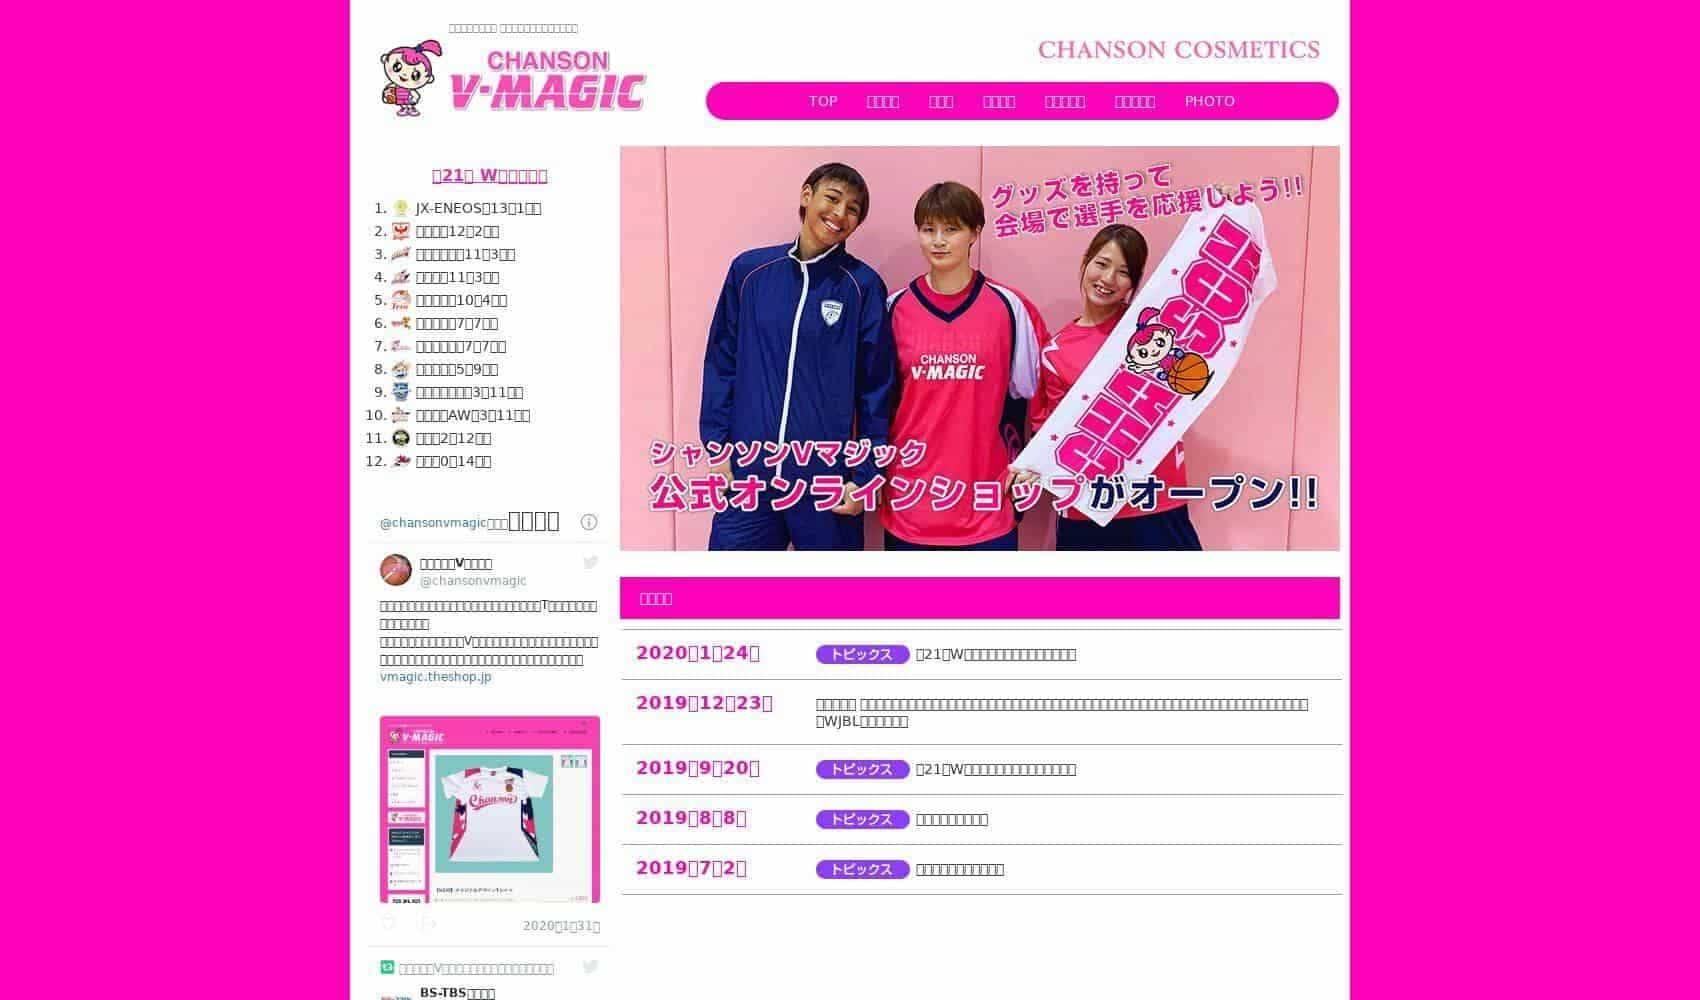 Chanson Cosmetics Co. Ltd. Chanson V-Majic